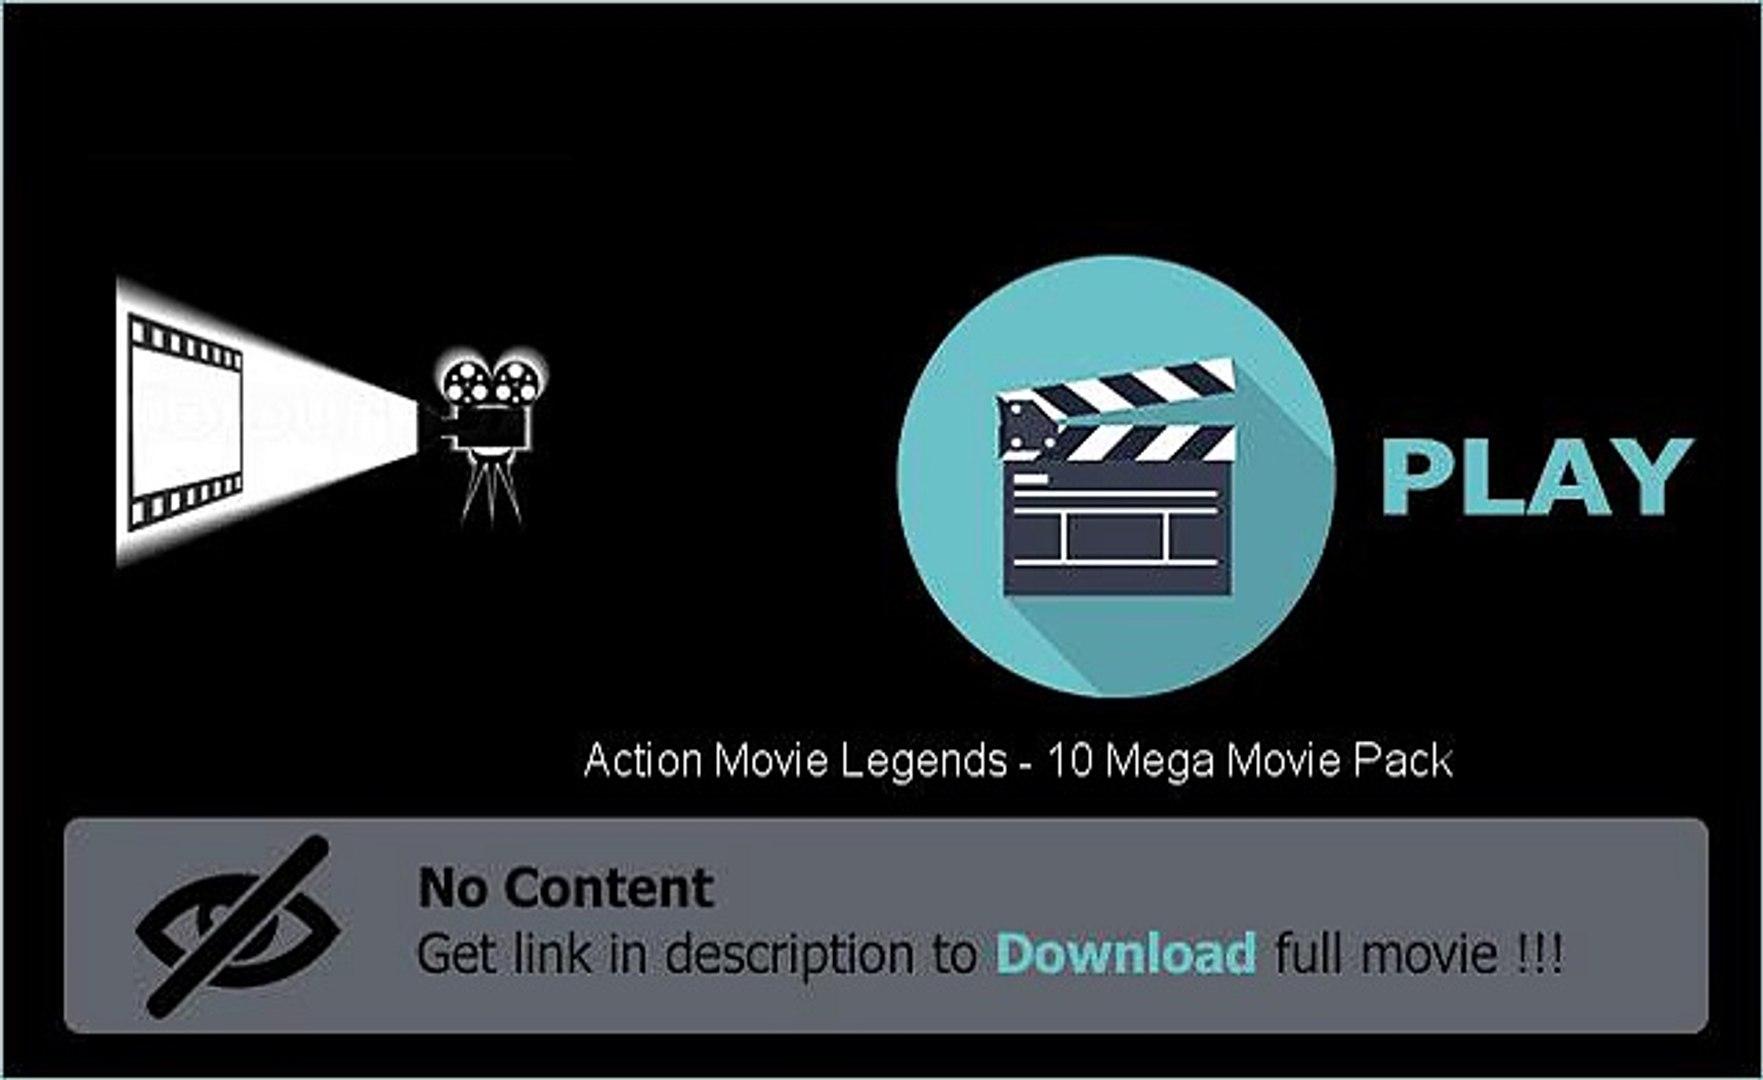 Action Movie Legends - 10 Mega Movie Pack Movie Download Free